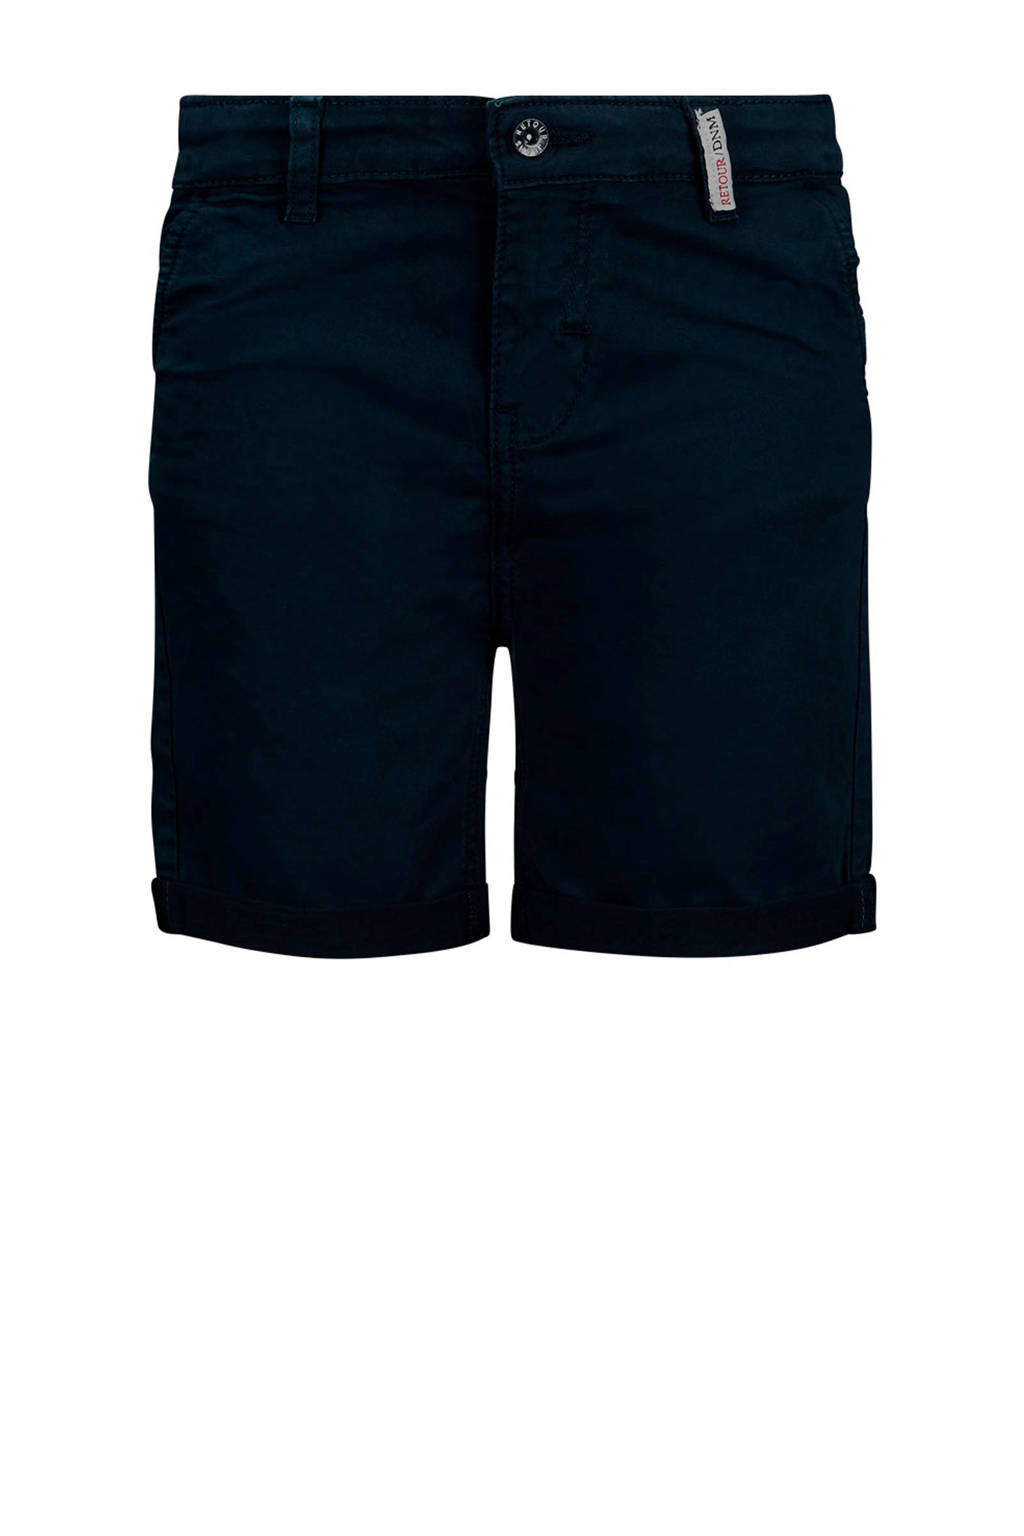 Retour Denim regular fit bermuda Stanley donkerblauw, Donkerblauw